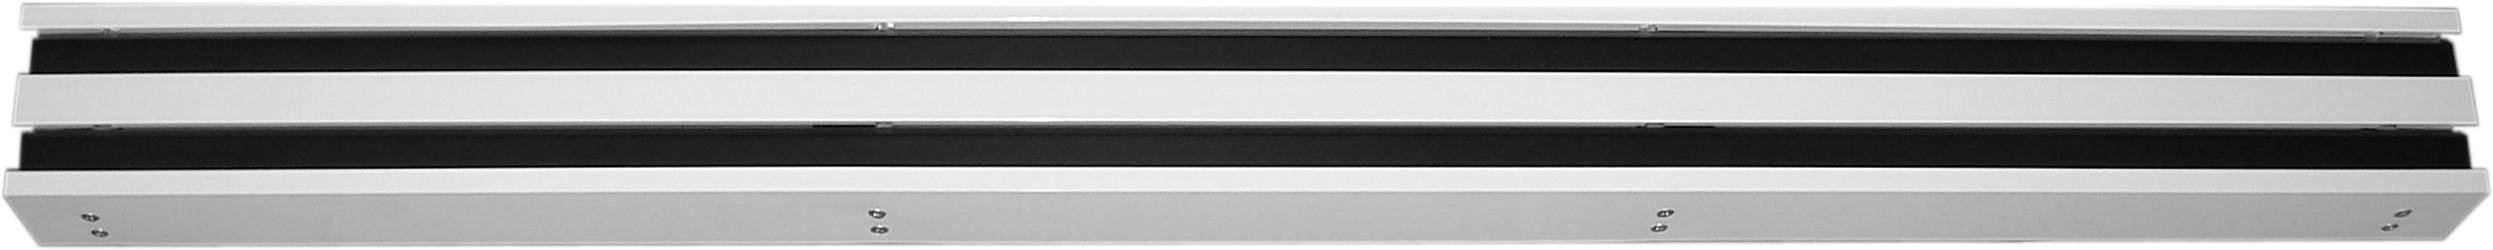 Frameless Slot diffusers